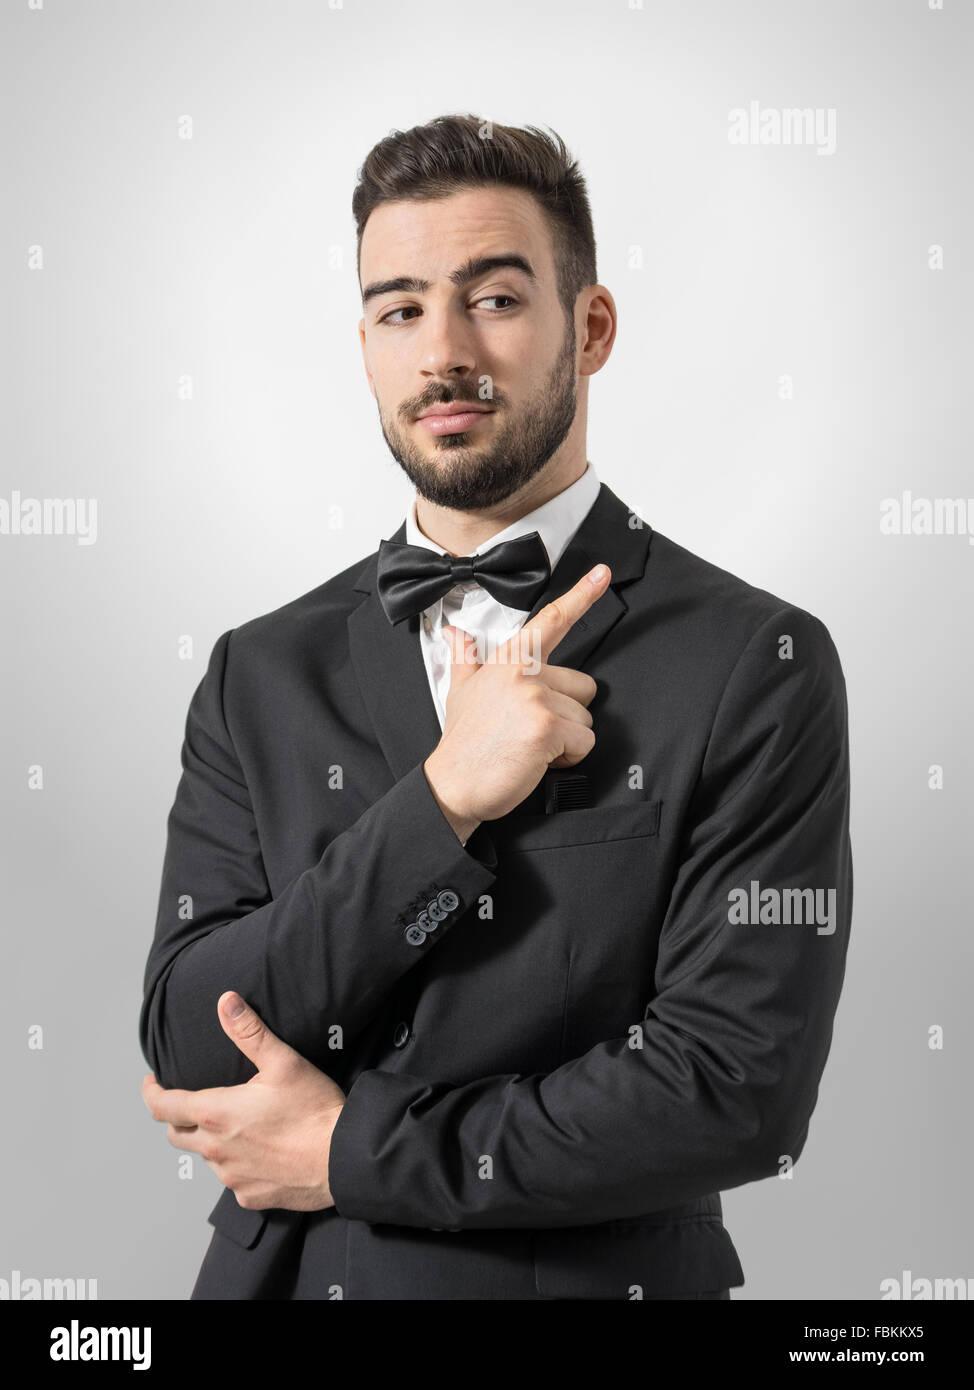 Secret service agent or bodyguard mimic pistol with hand gun gesture sign. Desaturated portrait over gray studio - Stock Image